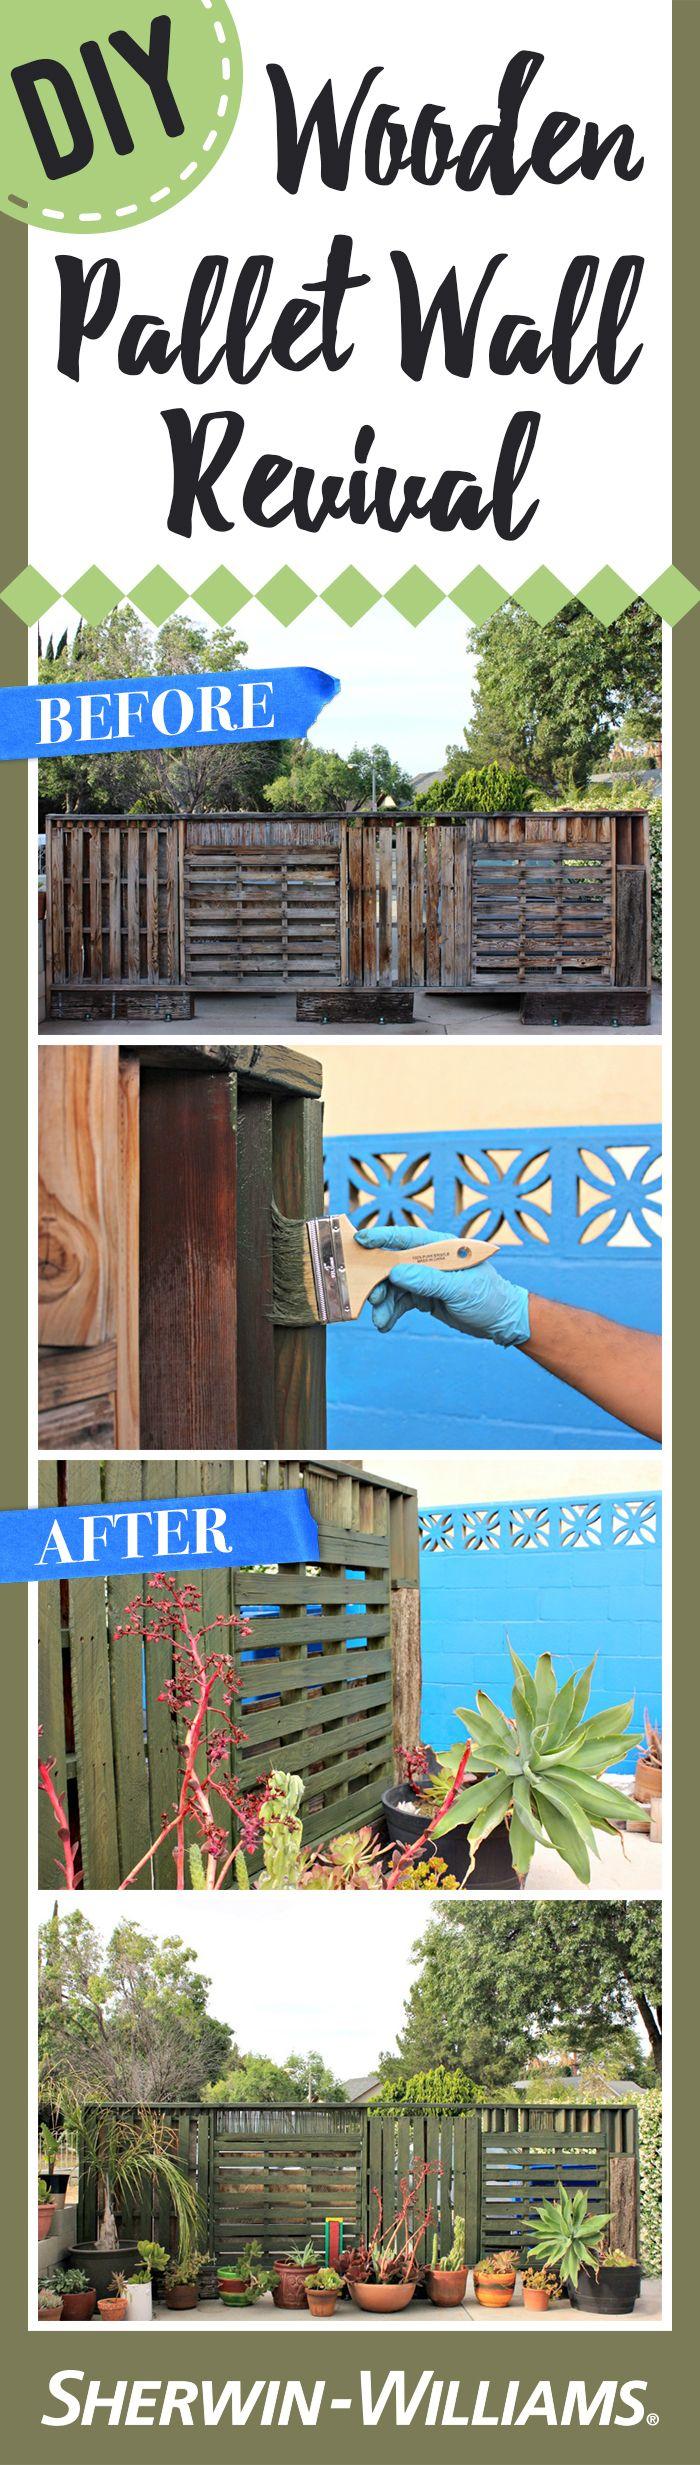 images about old pallets uses on pinterest ladder pallet